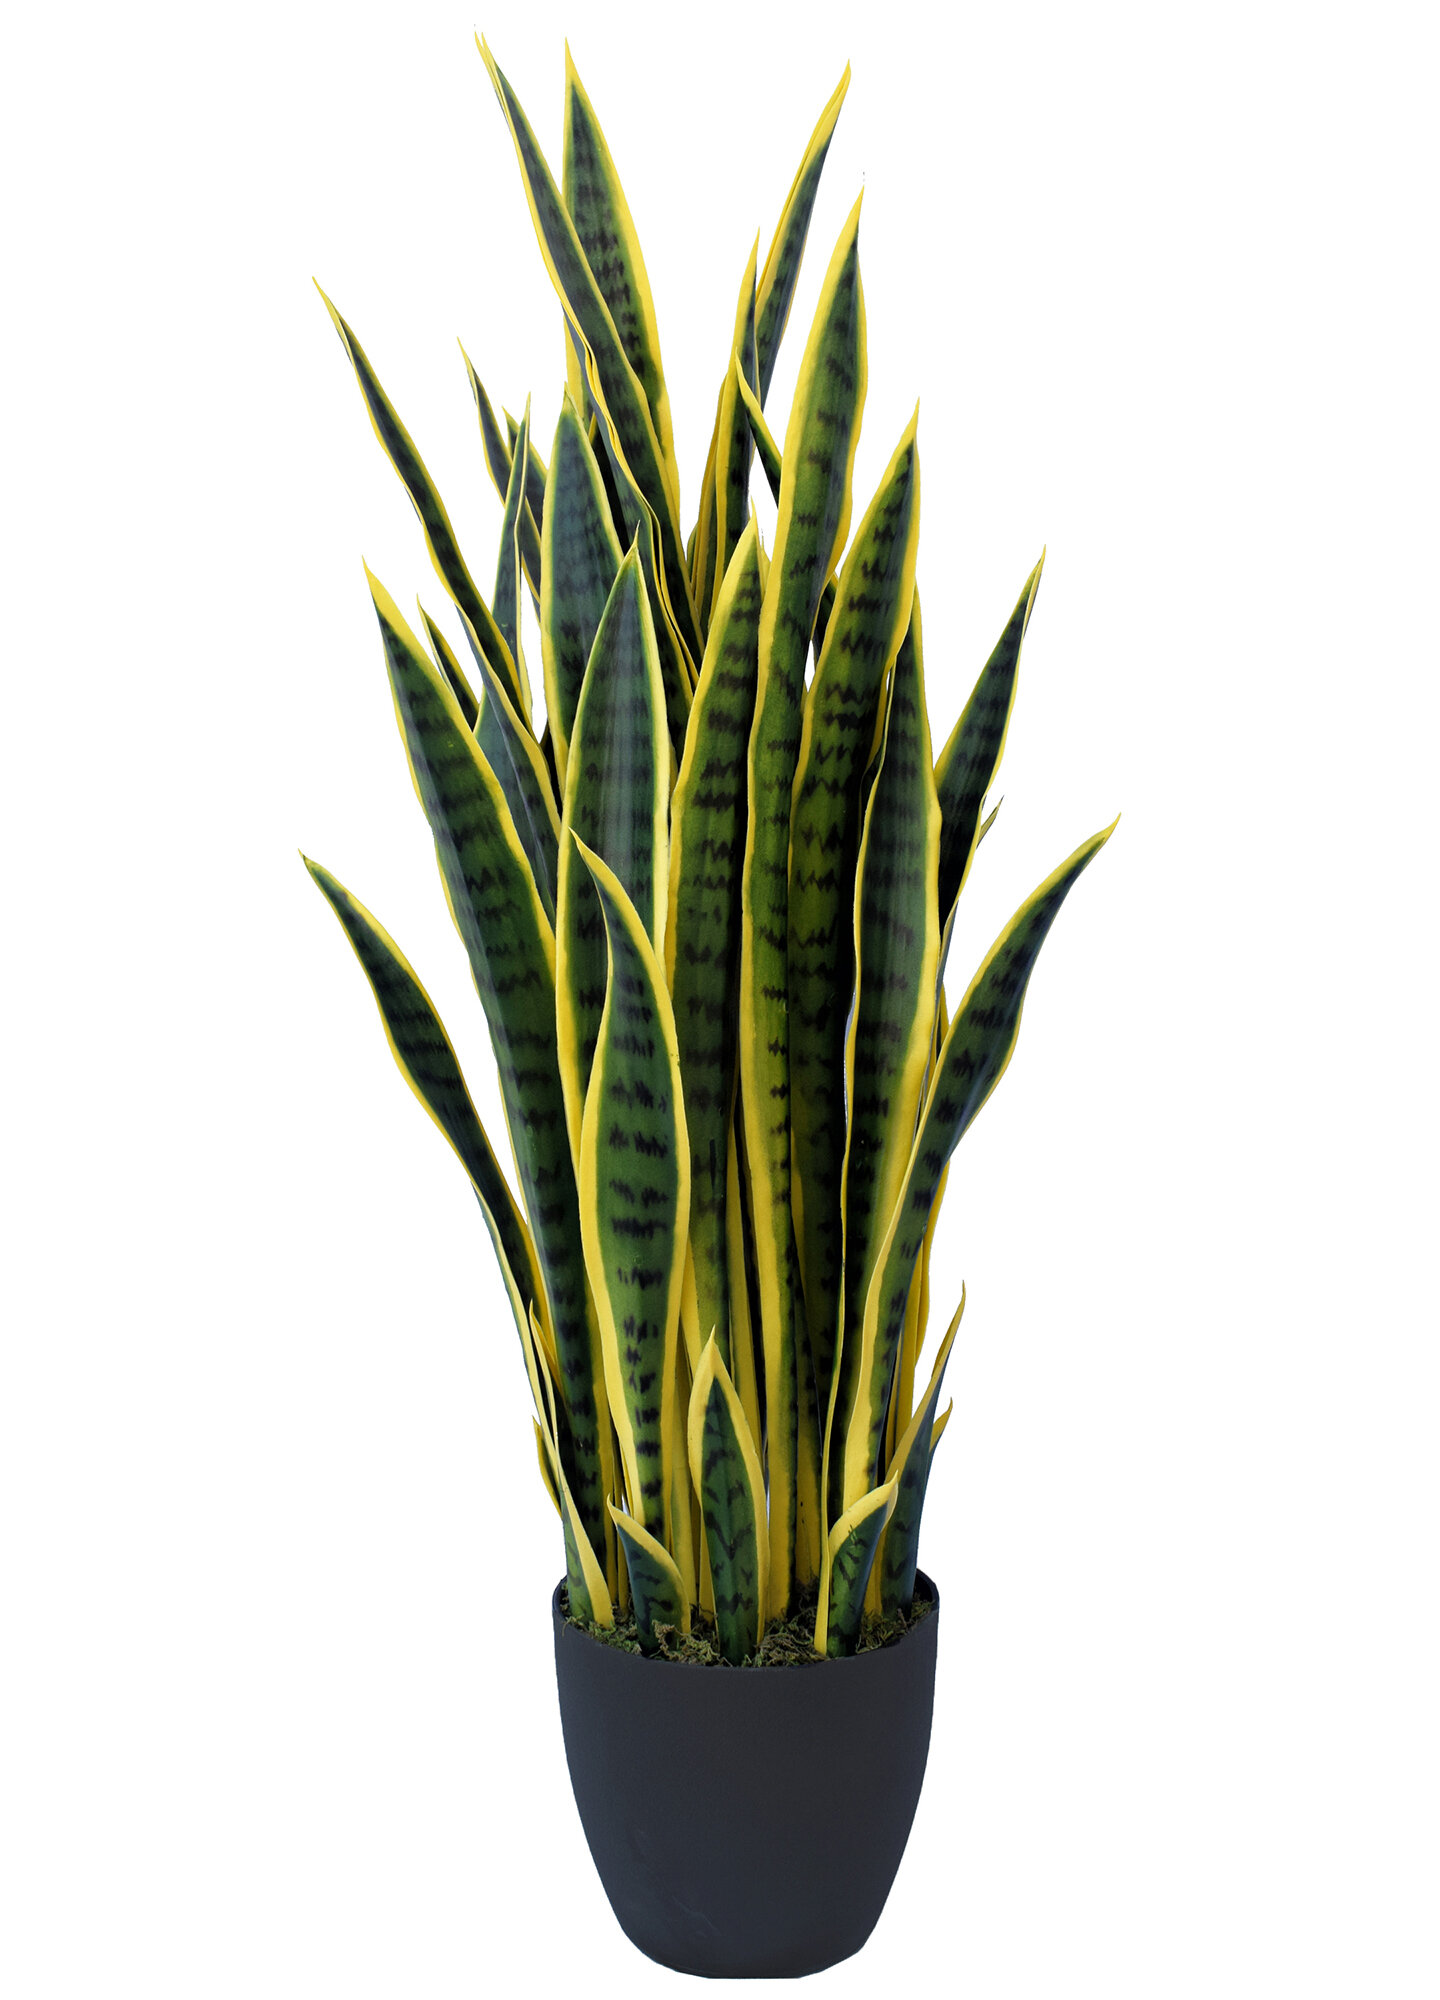 Orren Ellis Sansevieria Artificial Snake Plant Succulent In Pot Reviews Wayfair